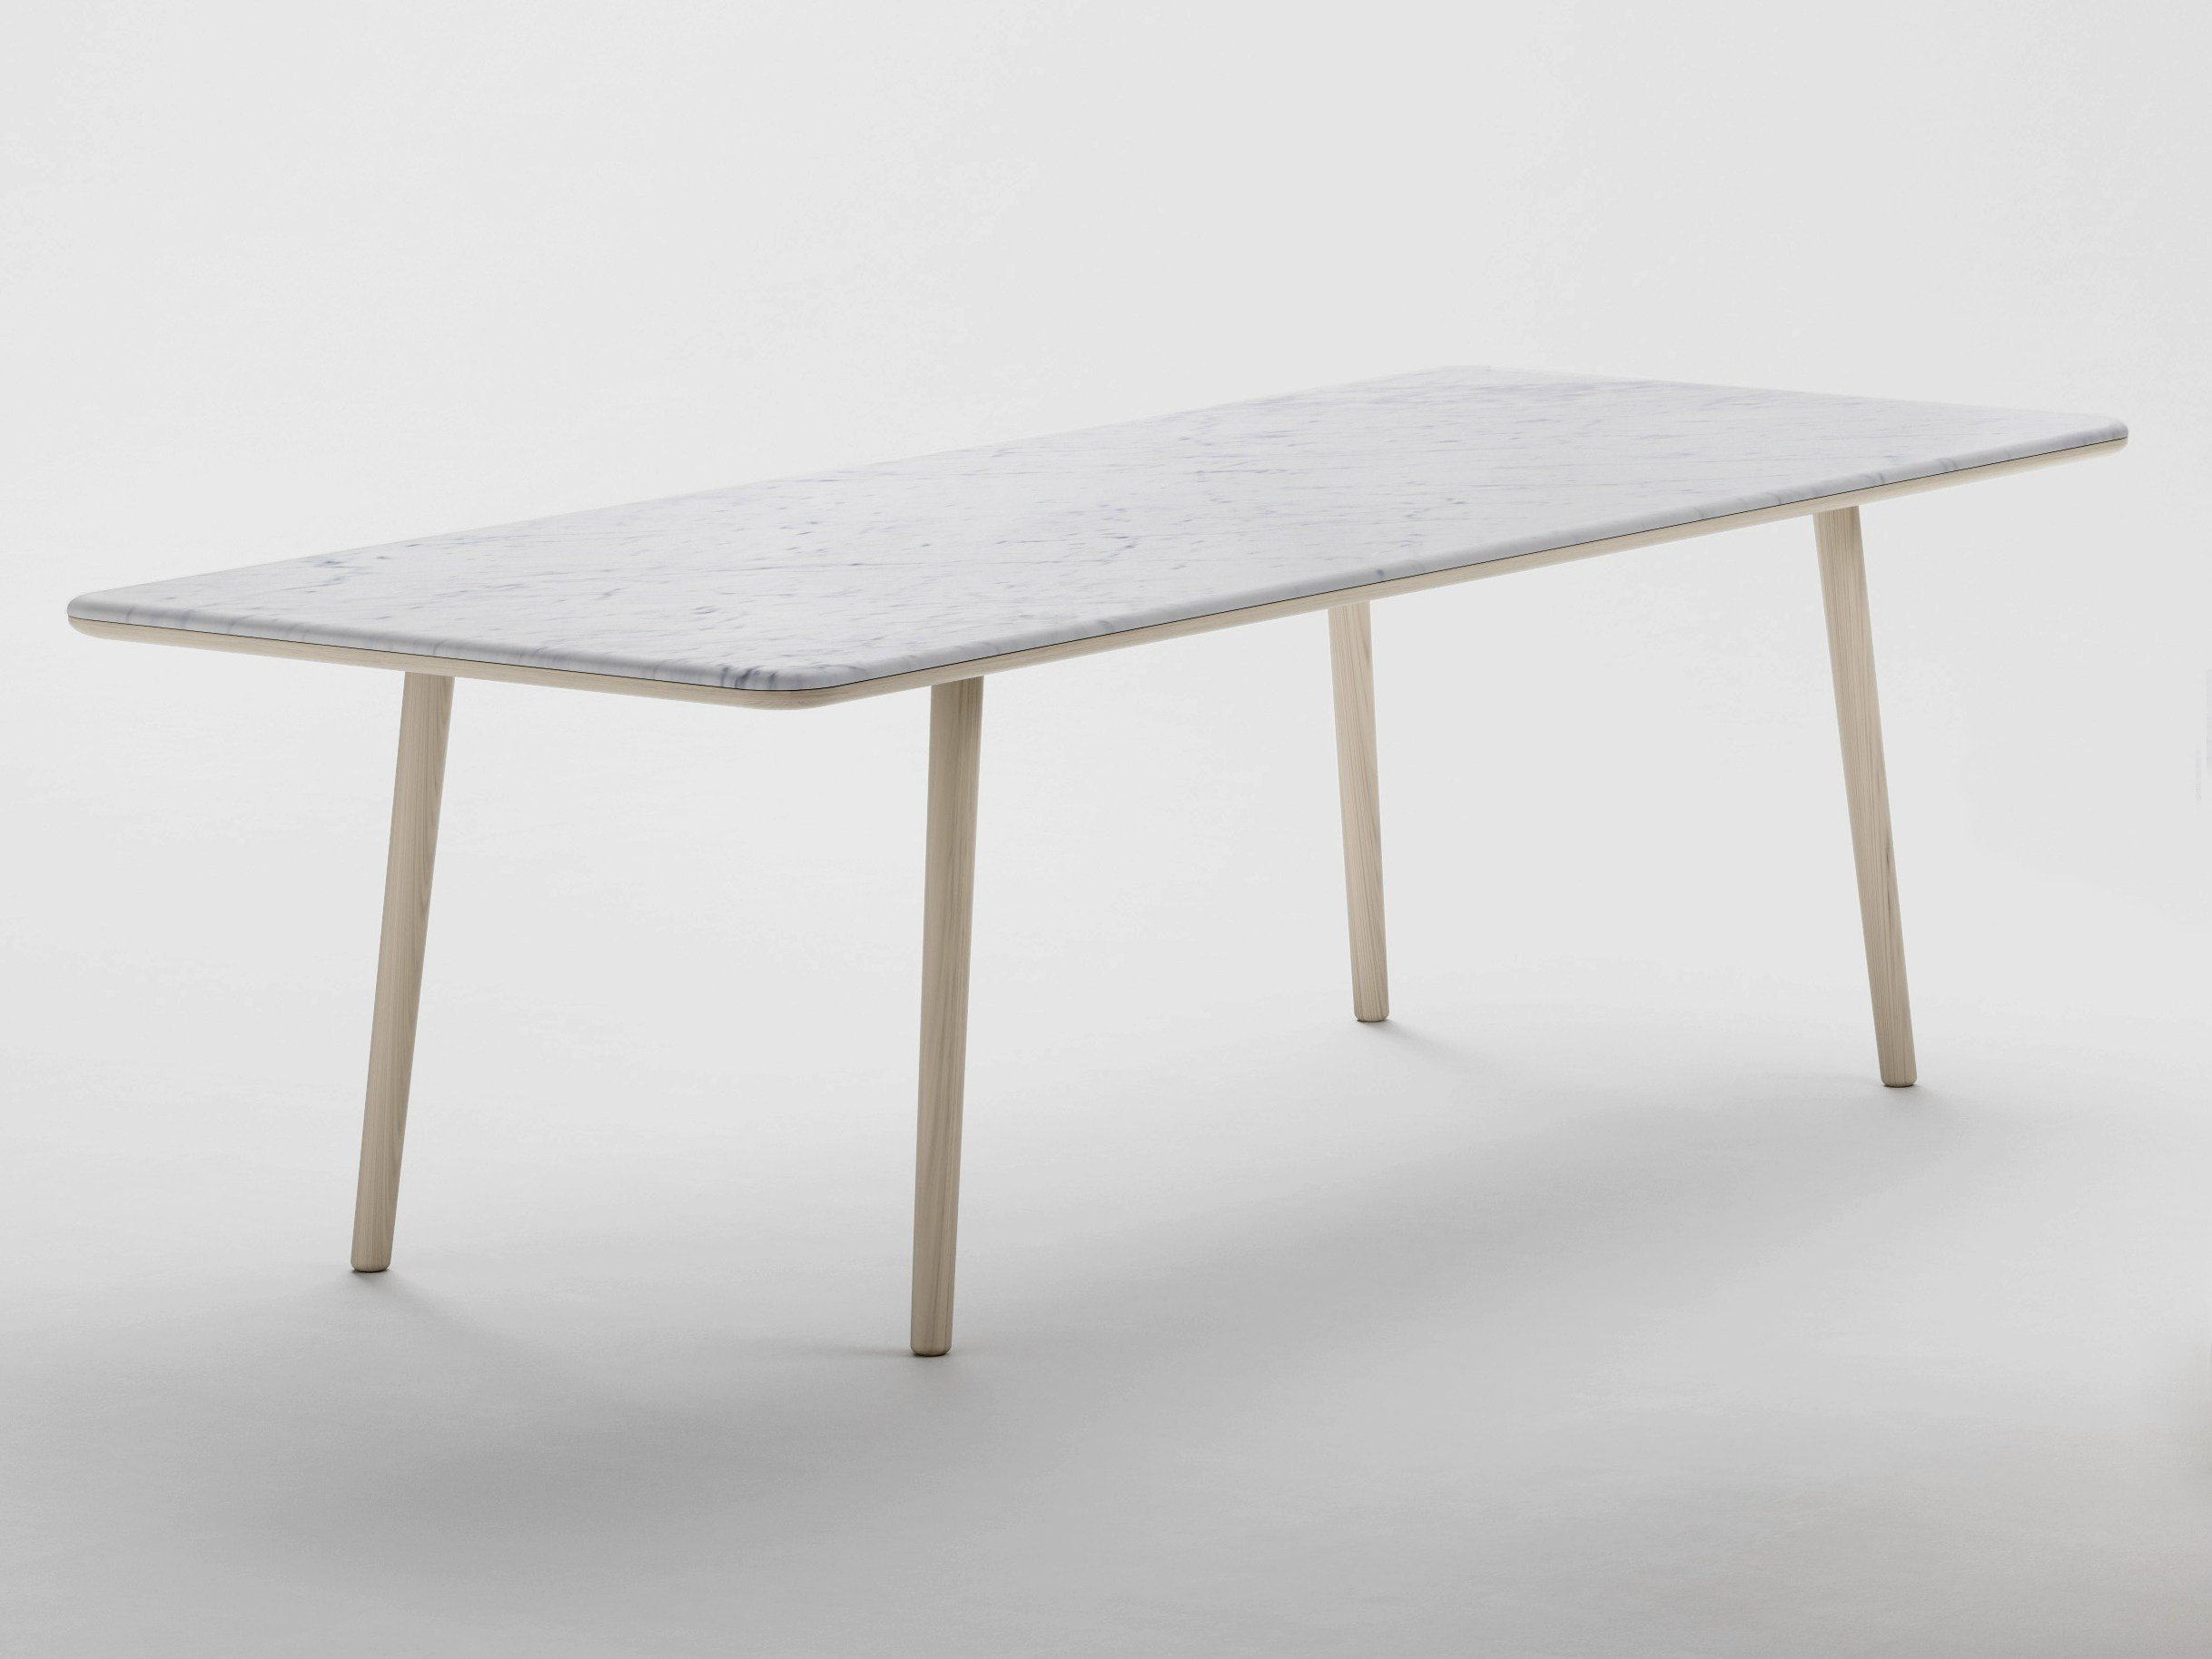 arin rectangular table by retegui design jean louis iratzoki. Black Bedroom Furniture Sets. Home Design Ideas